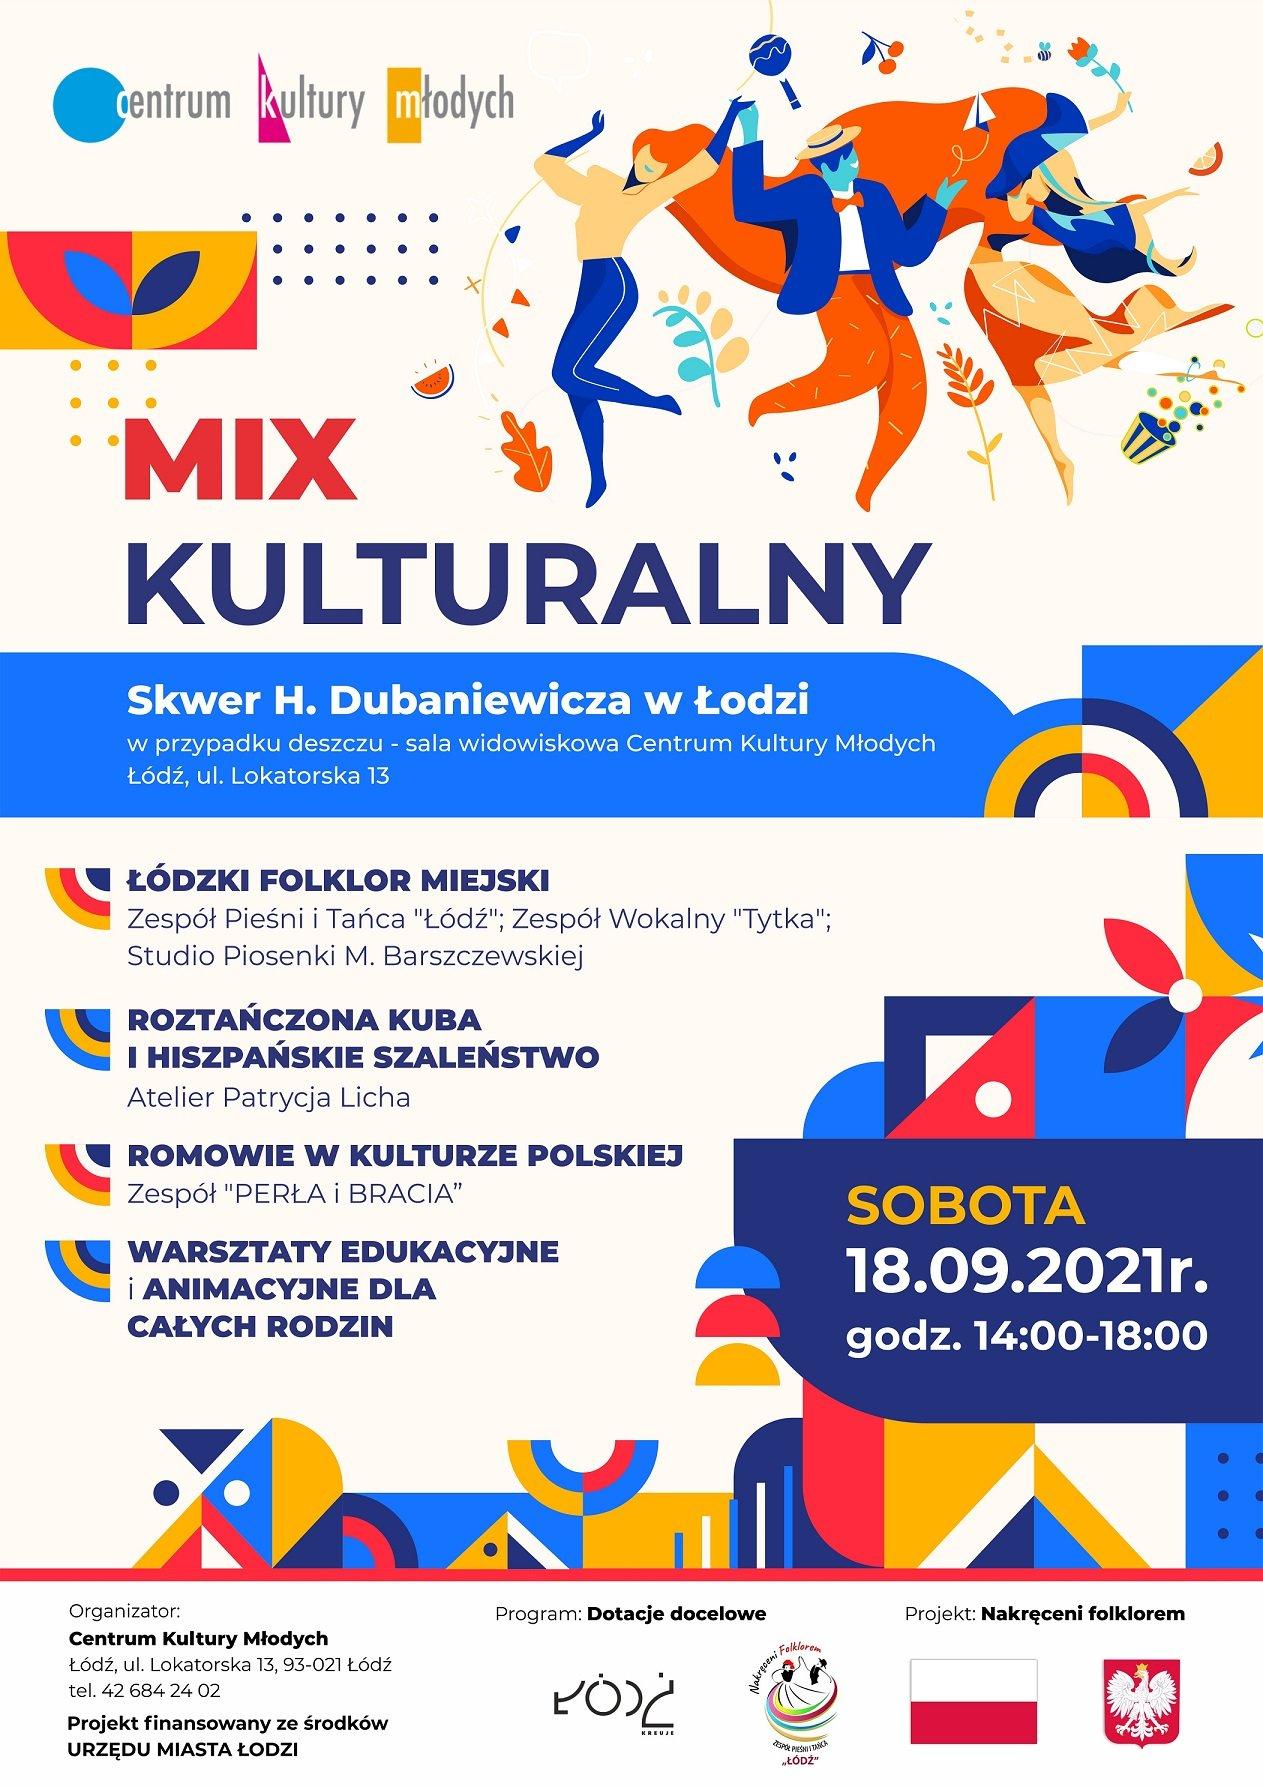 Mix Kulturalny - piknik